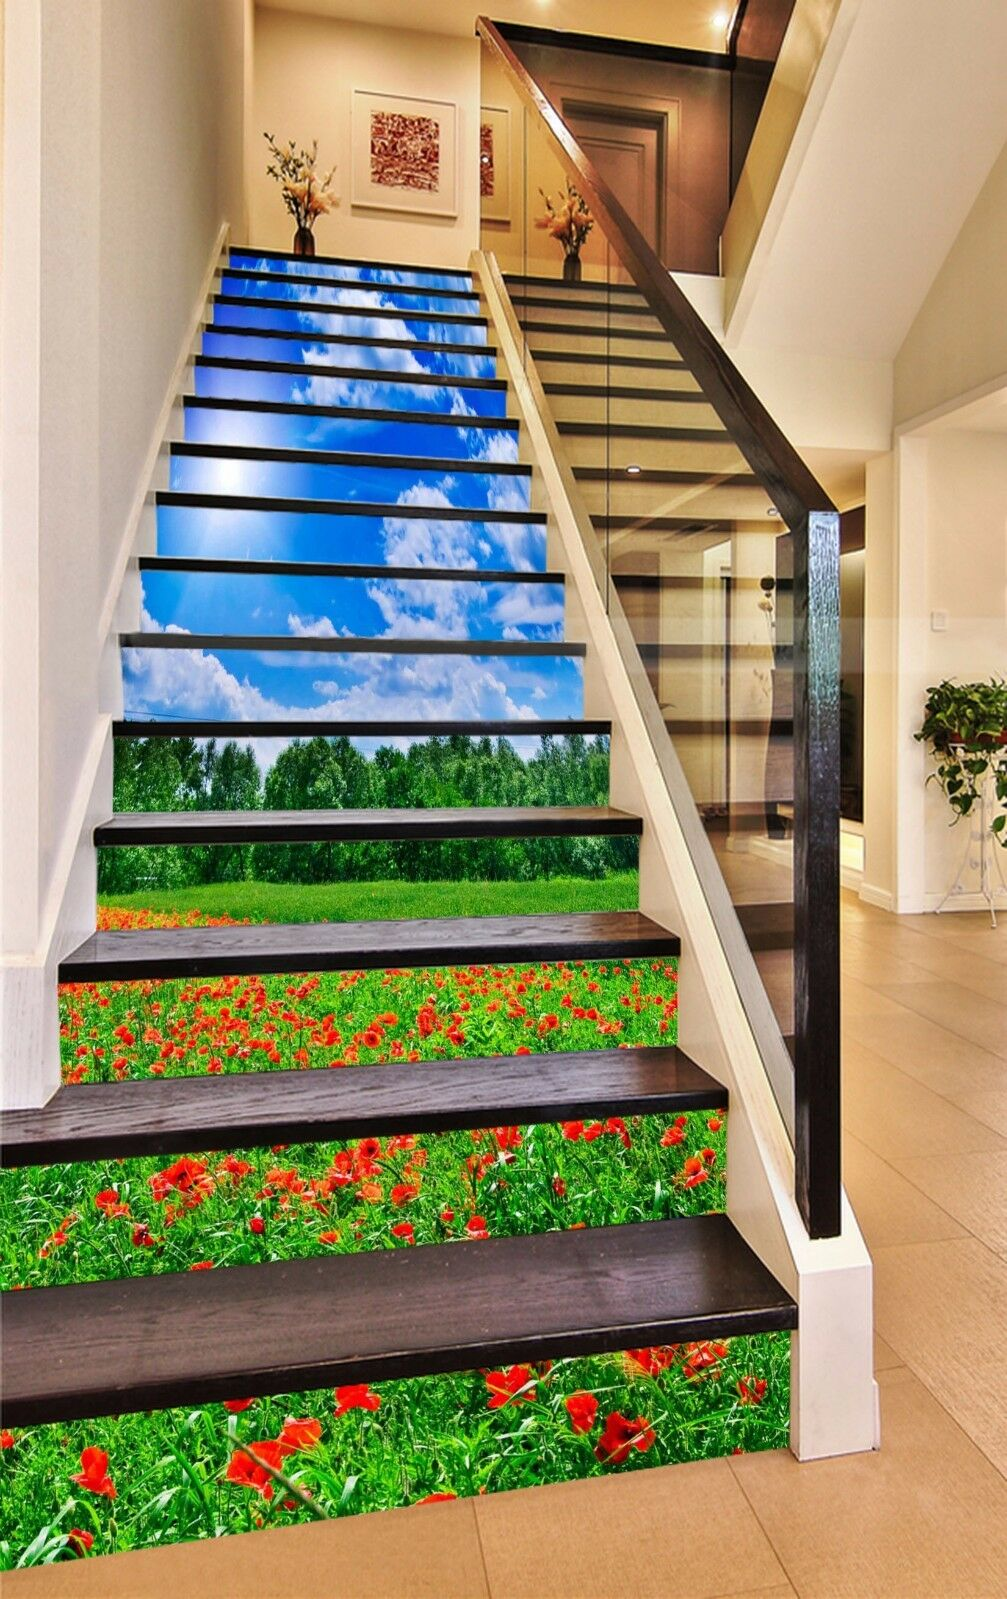 3D Flowers Plant 78 Stair Risers Decoration Photo Mural Vinyl Decal Wallpaper AU